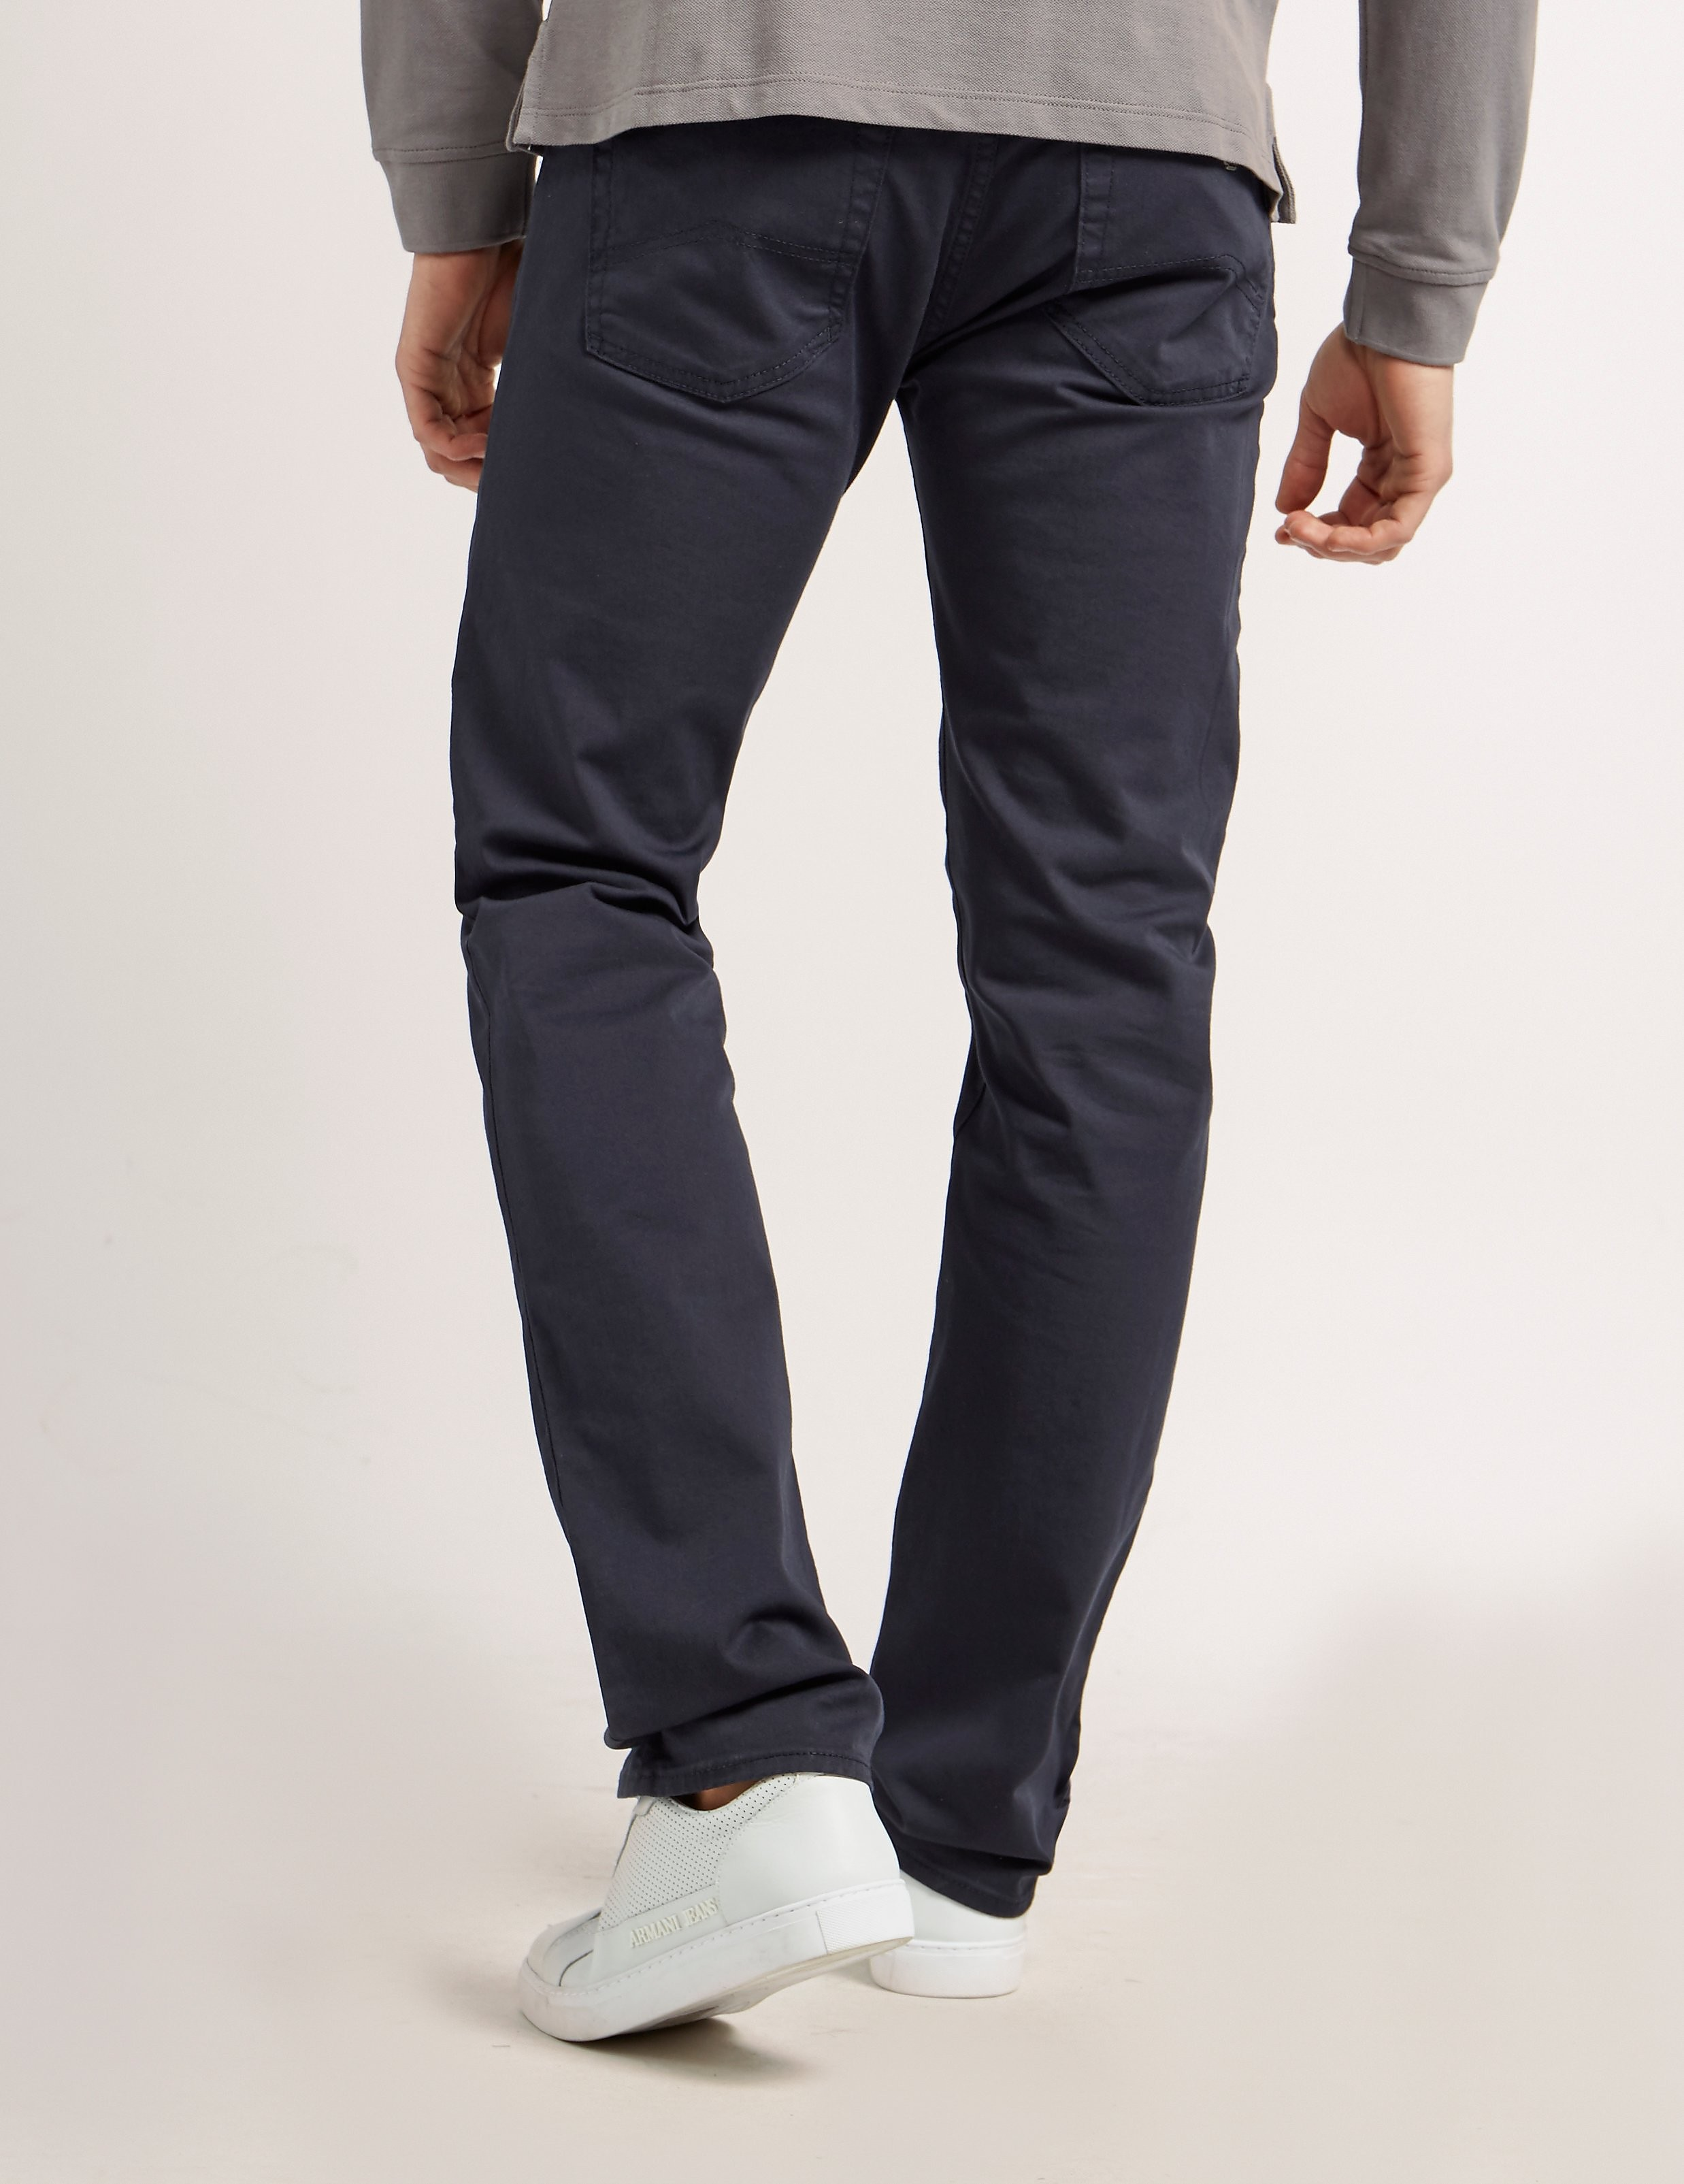 Armani Jeans J45 Bull Regular Jeans